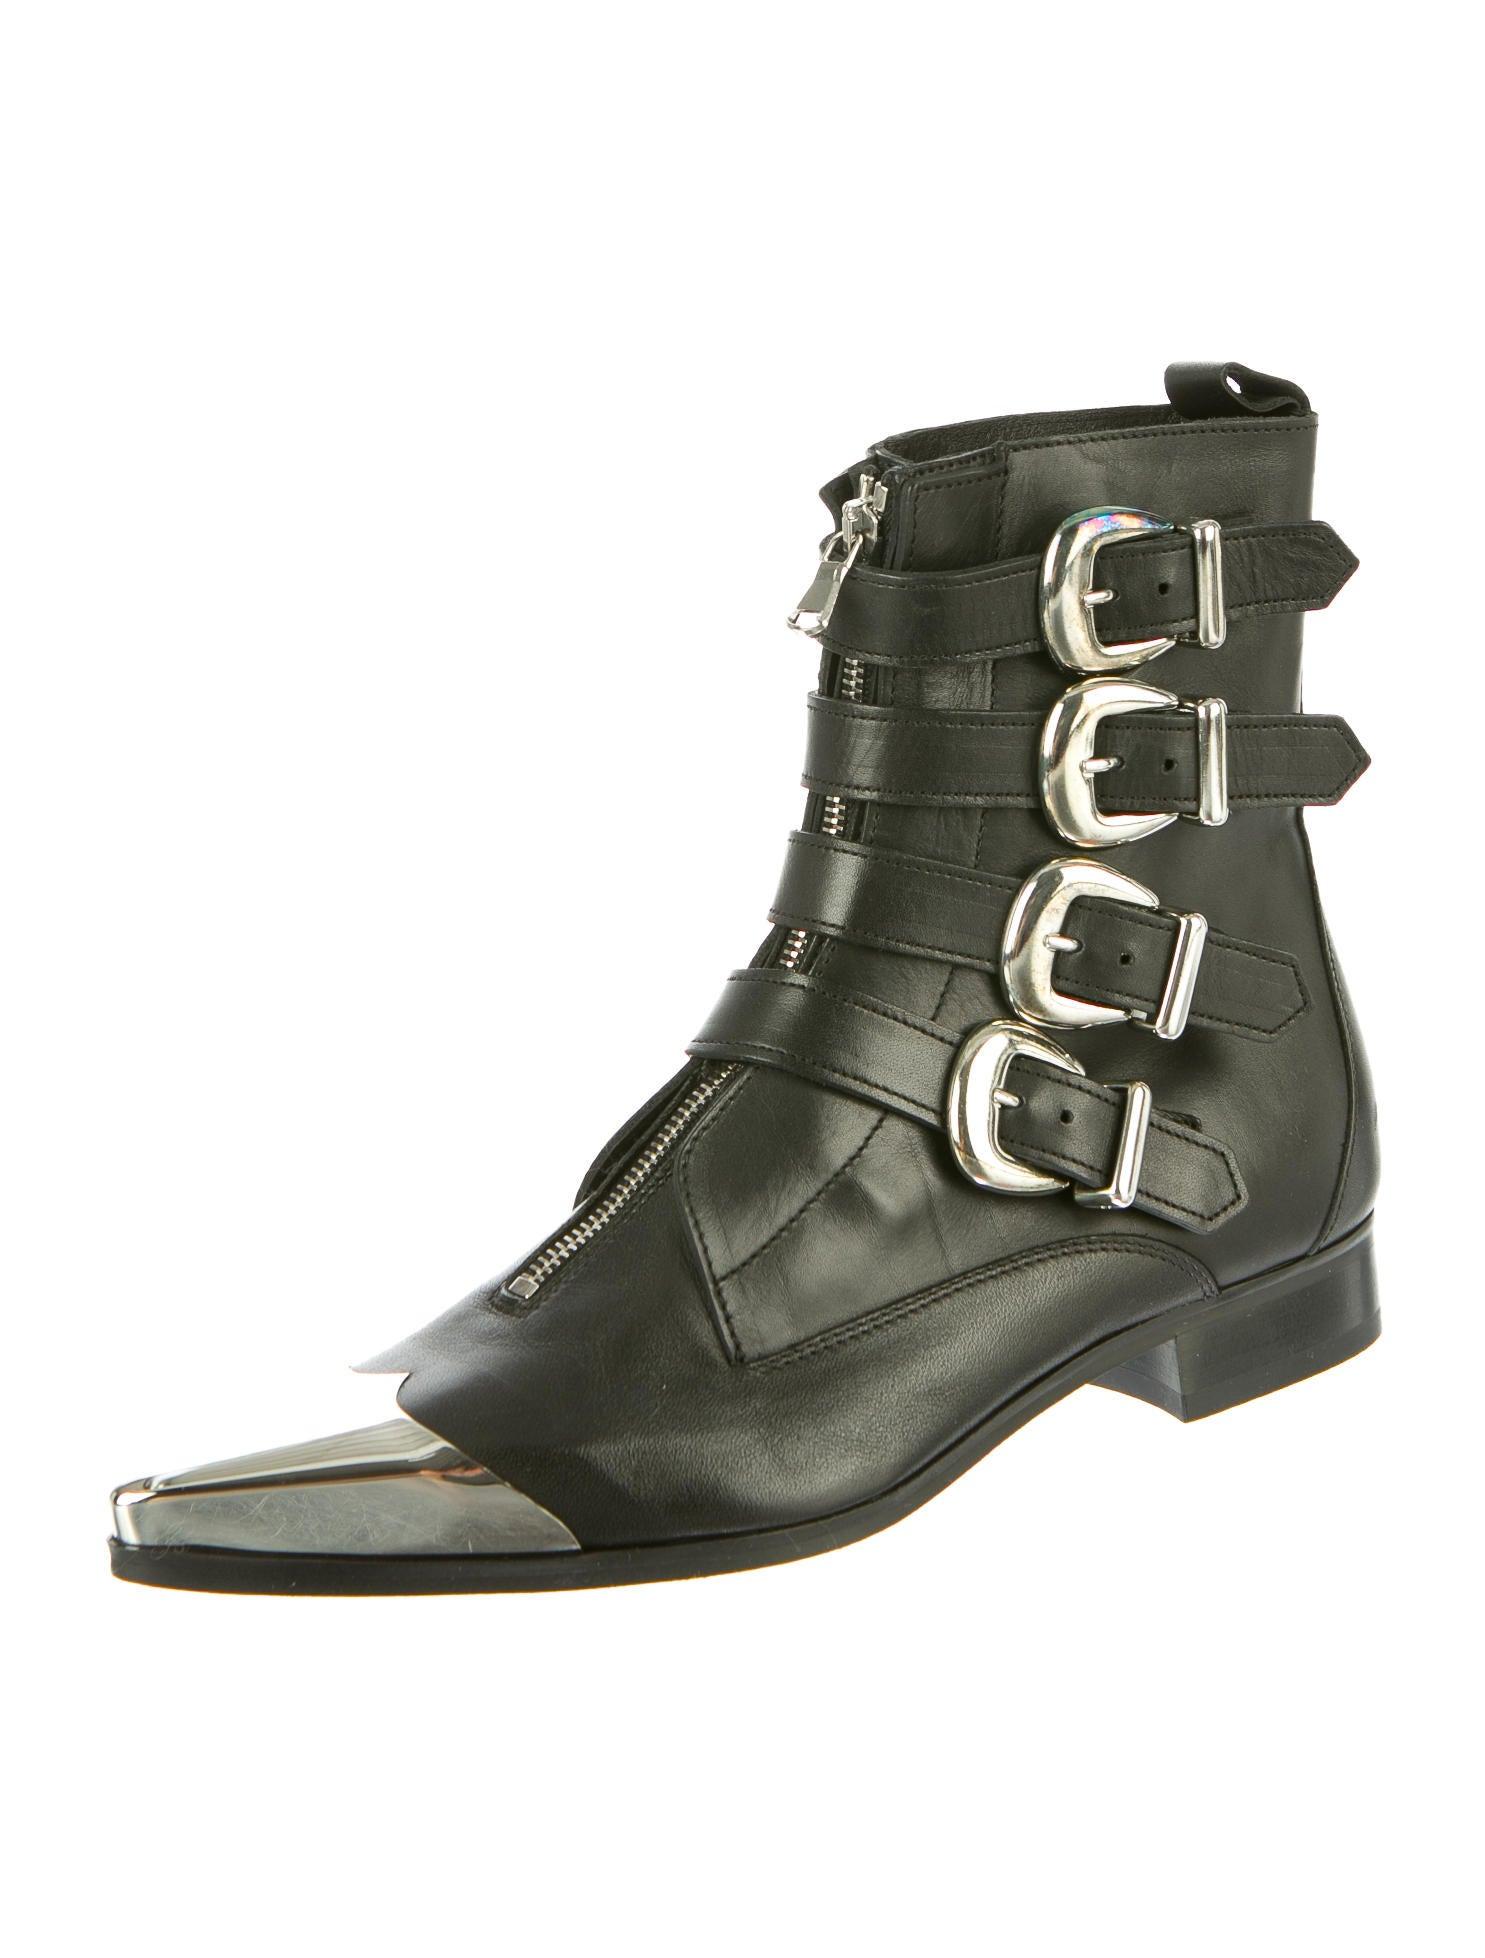 New Mongrel Boots 260020 Black Steel Toe Work Boots Womens - Koolstuff Australia